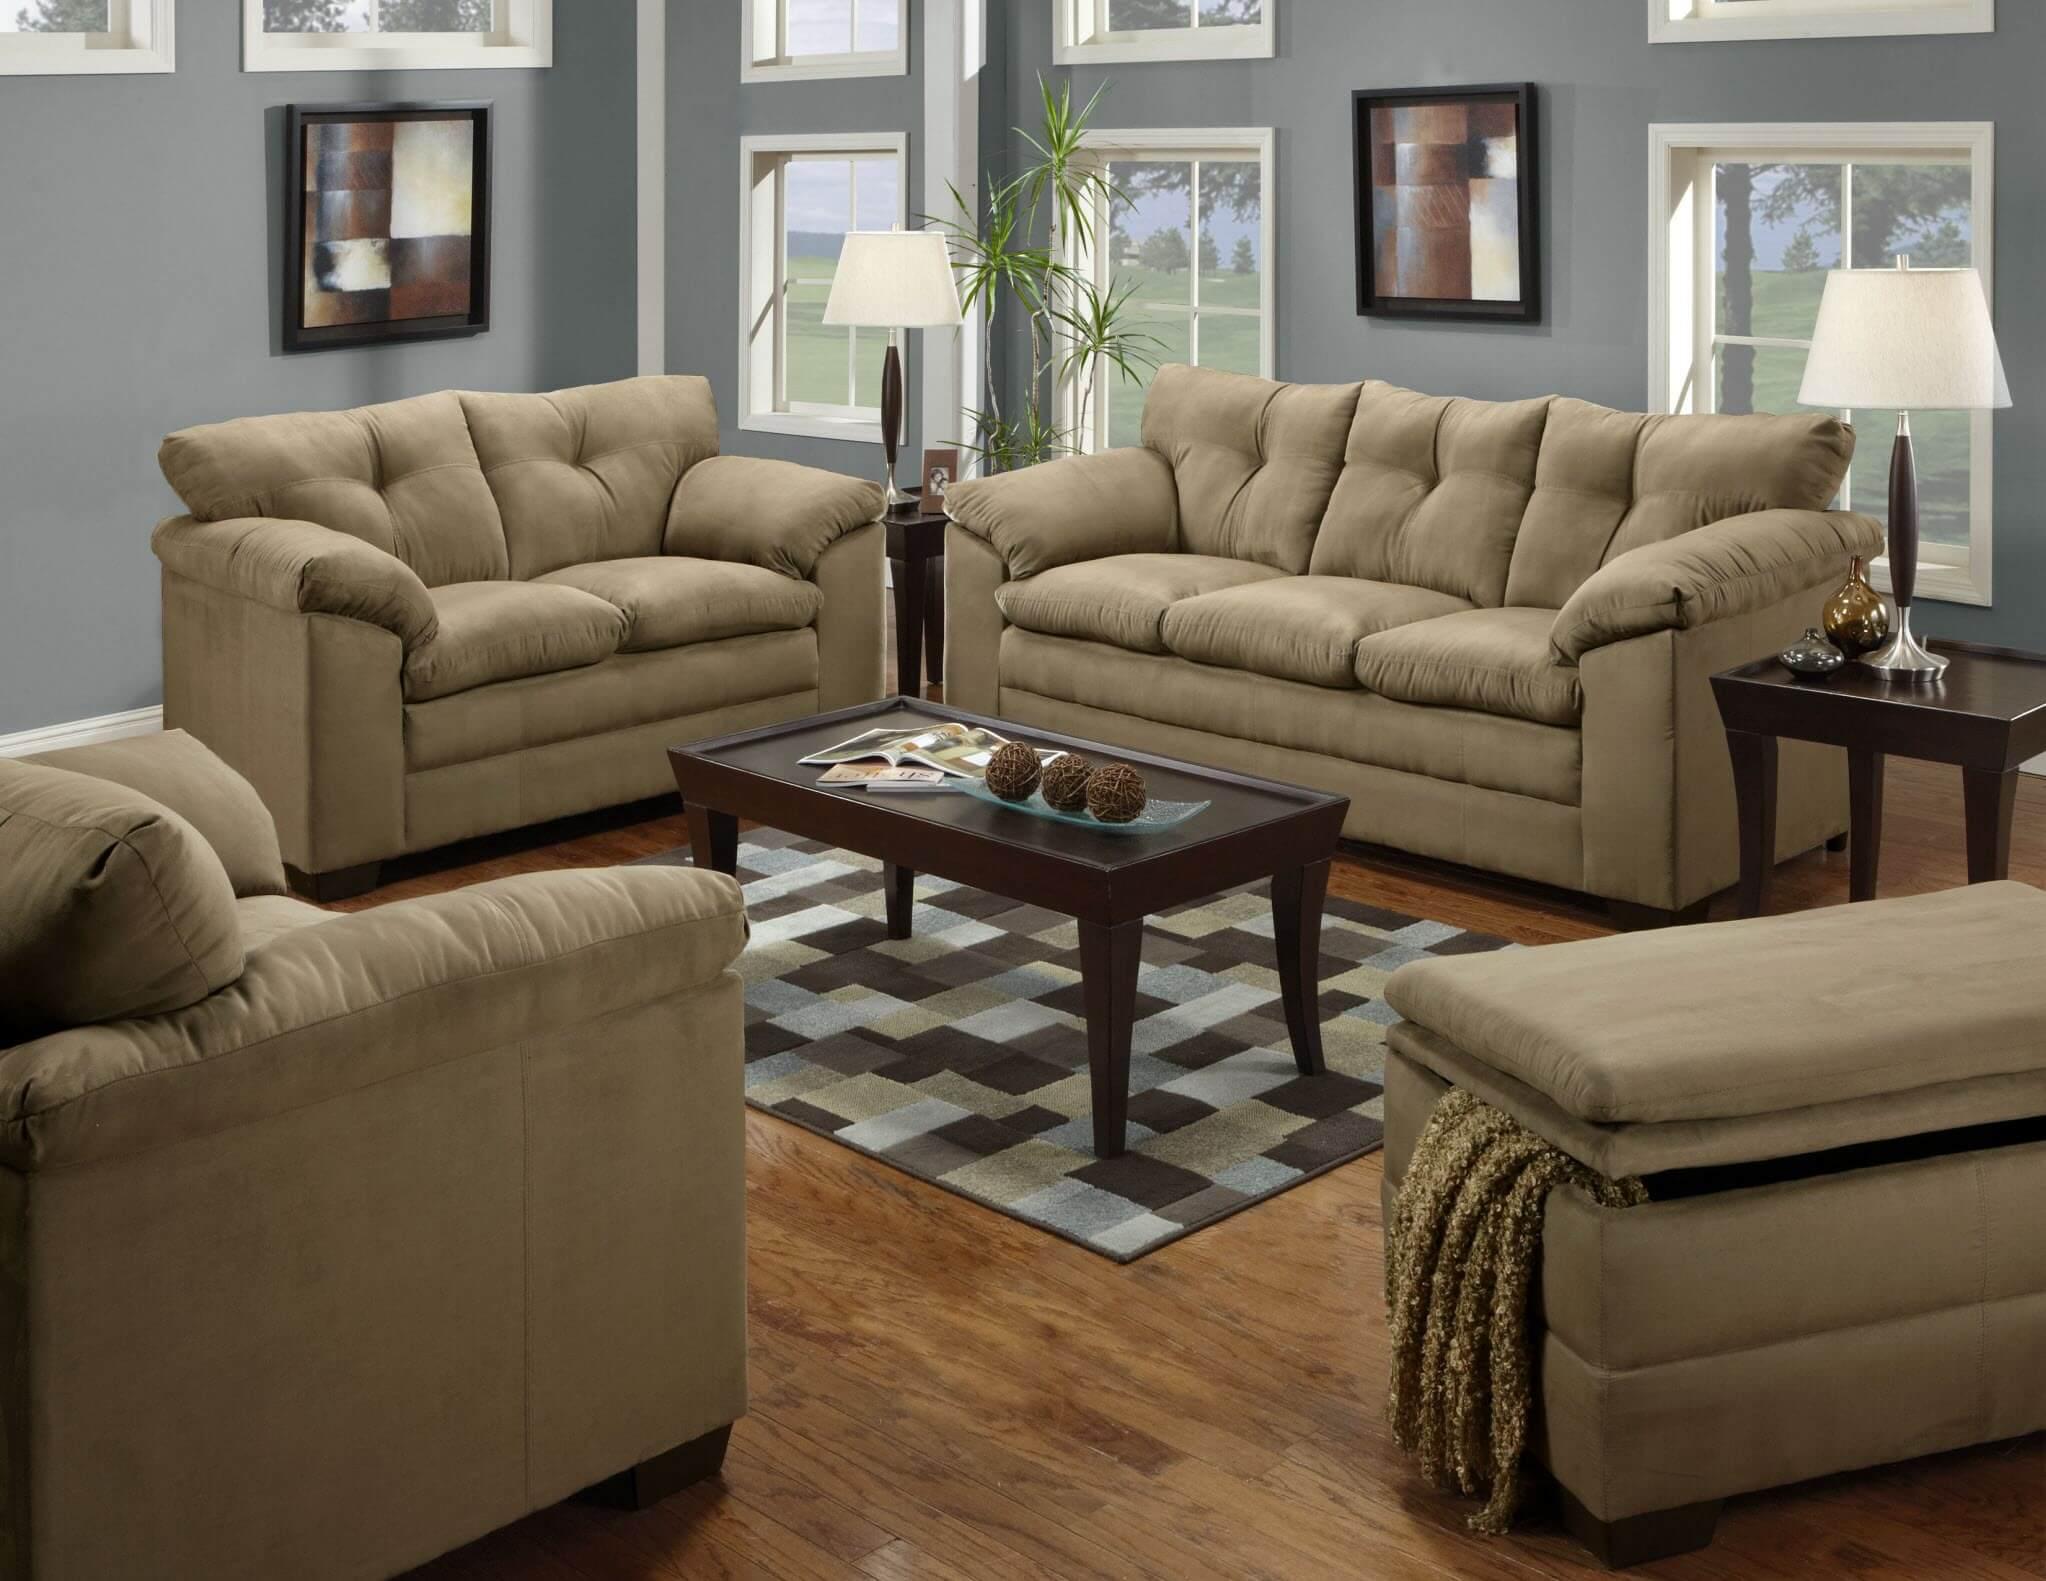 Luna Latte Sofa And Loveseat Fabric Living Room Sets